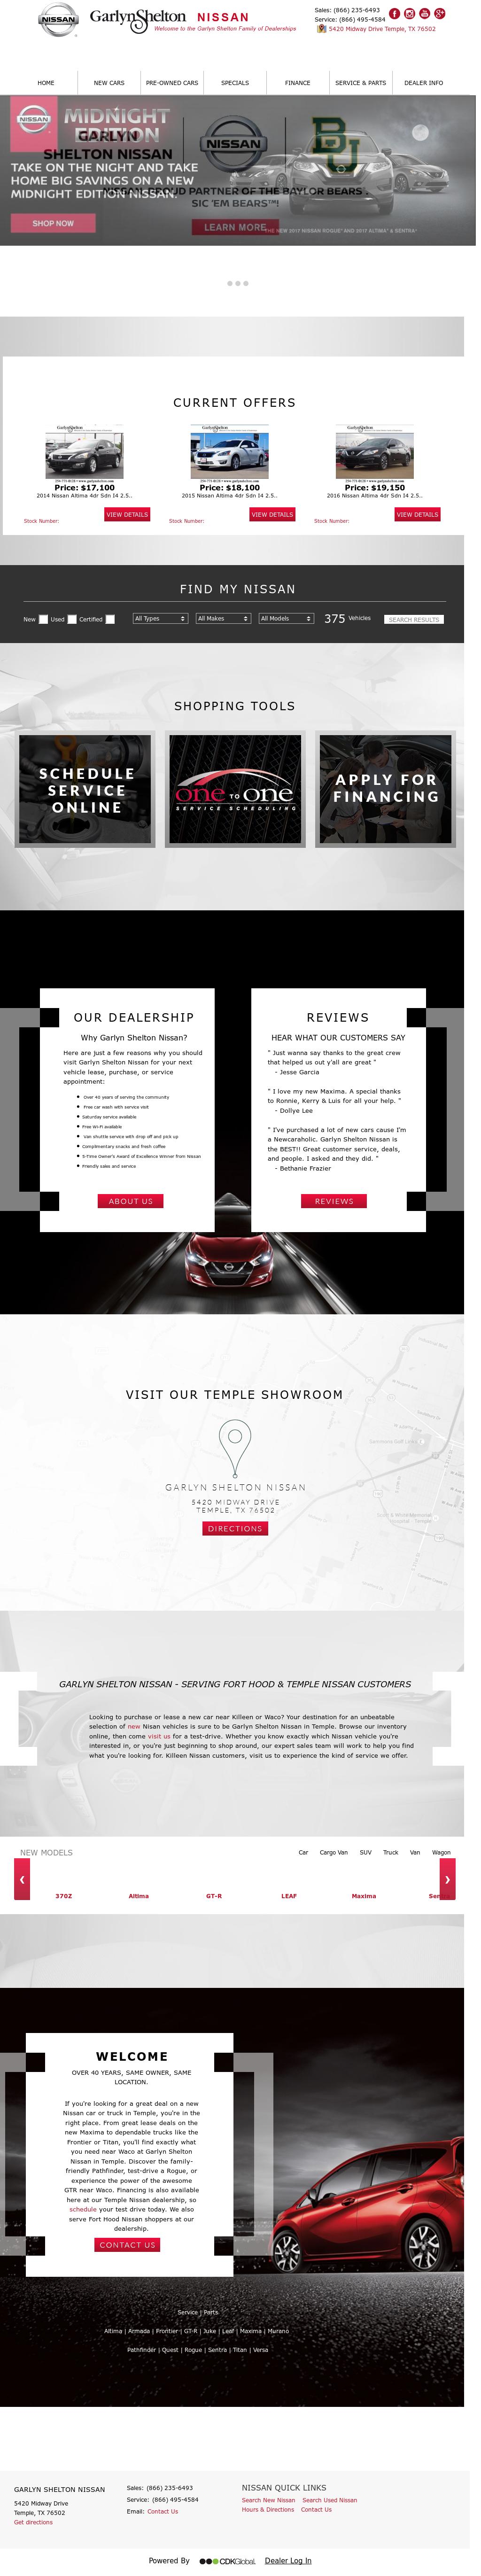 Garlyn Shelton Nissan >> Garlyn Shelton Nissan Temple Tx Competitors Revenue And